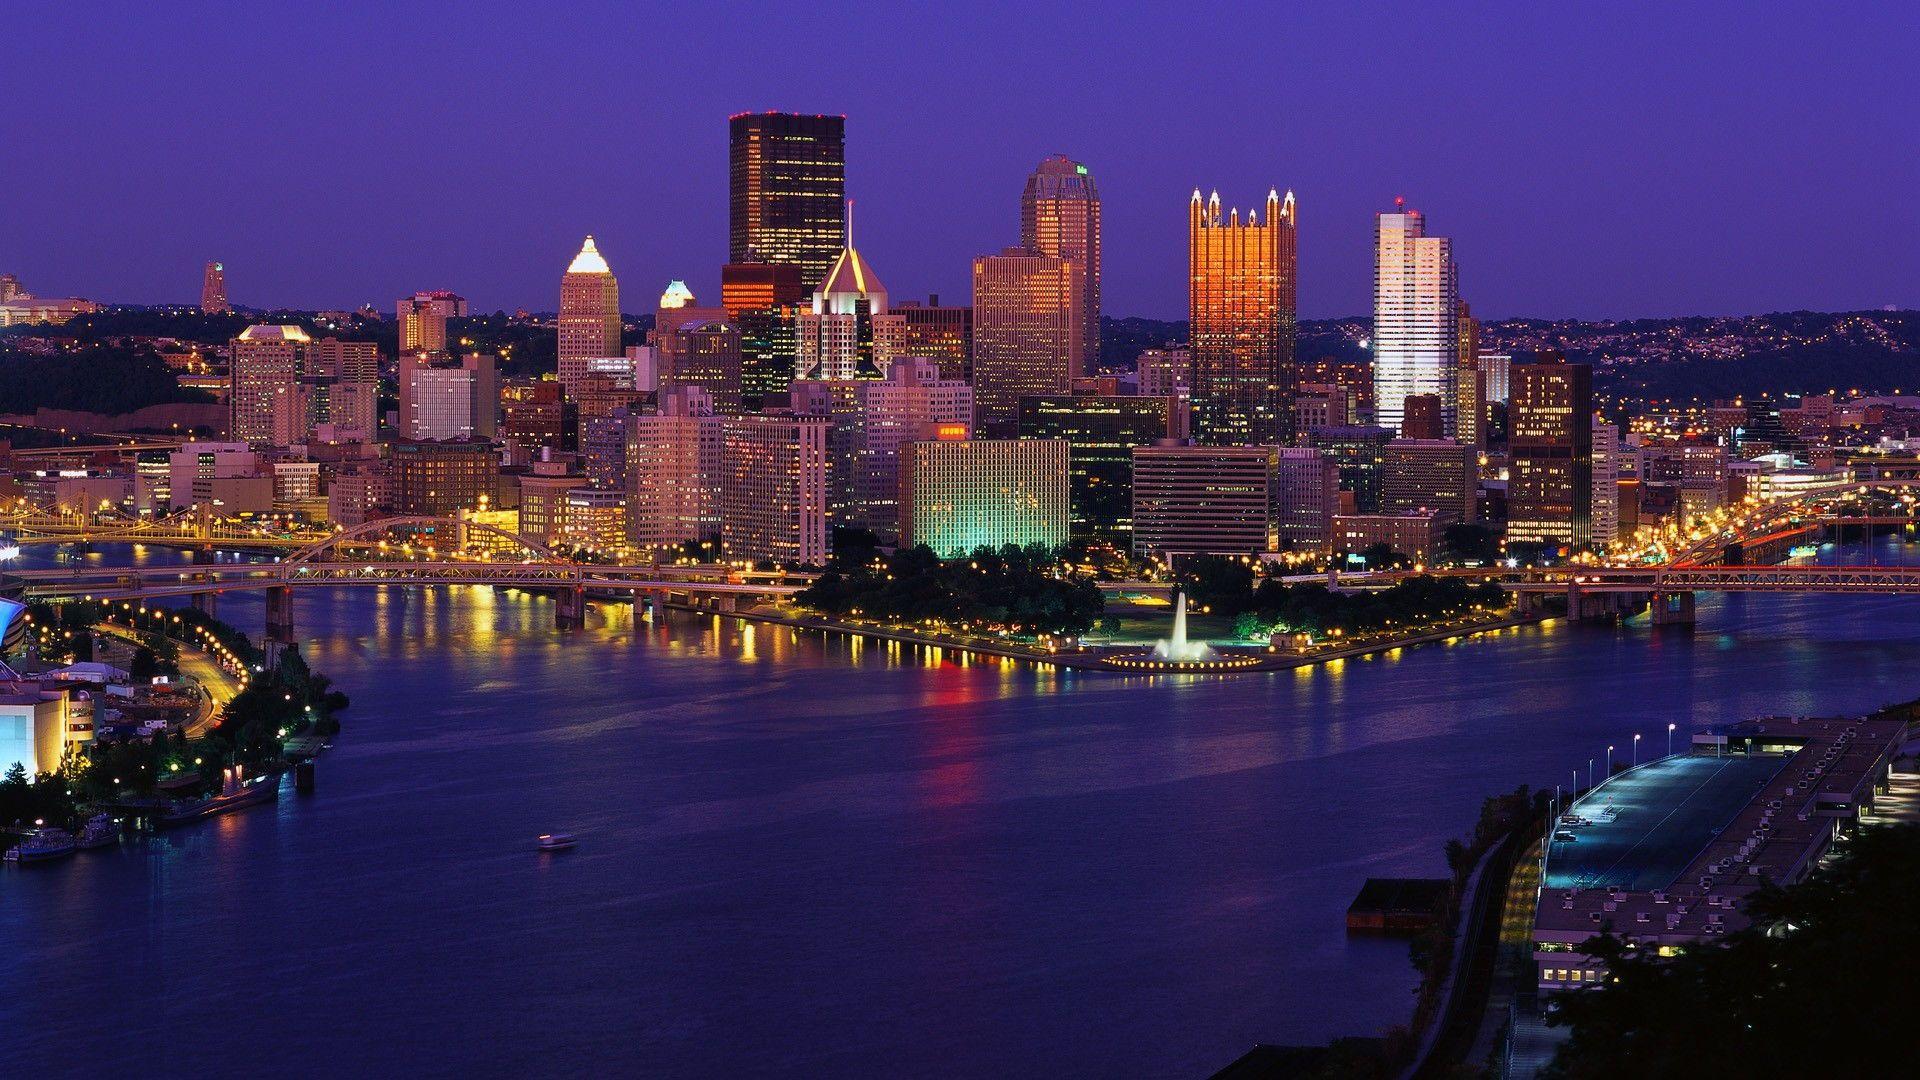 Pittsburgh Skyline At Night Wallpaper Pittsburgh Skyline Picture Hd Dekstop Wallpapers Of Pittsburgh Usa Pittsburgh Skyline Skyline Picture City Tumblr